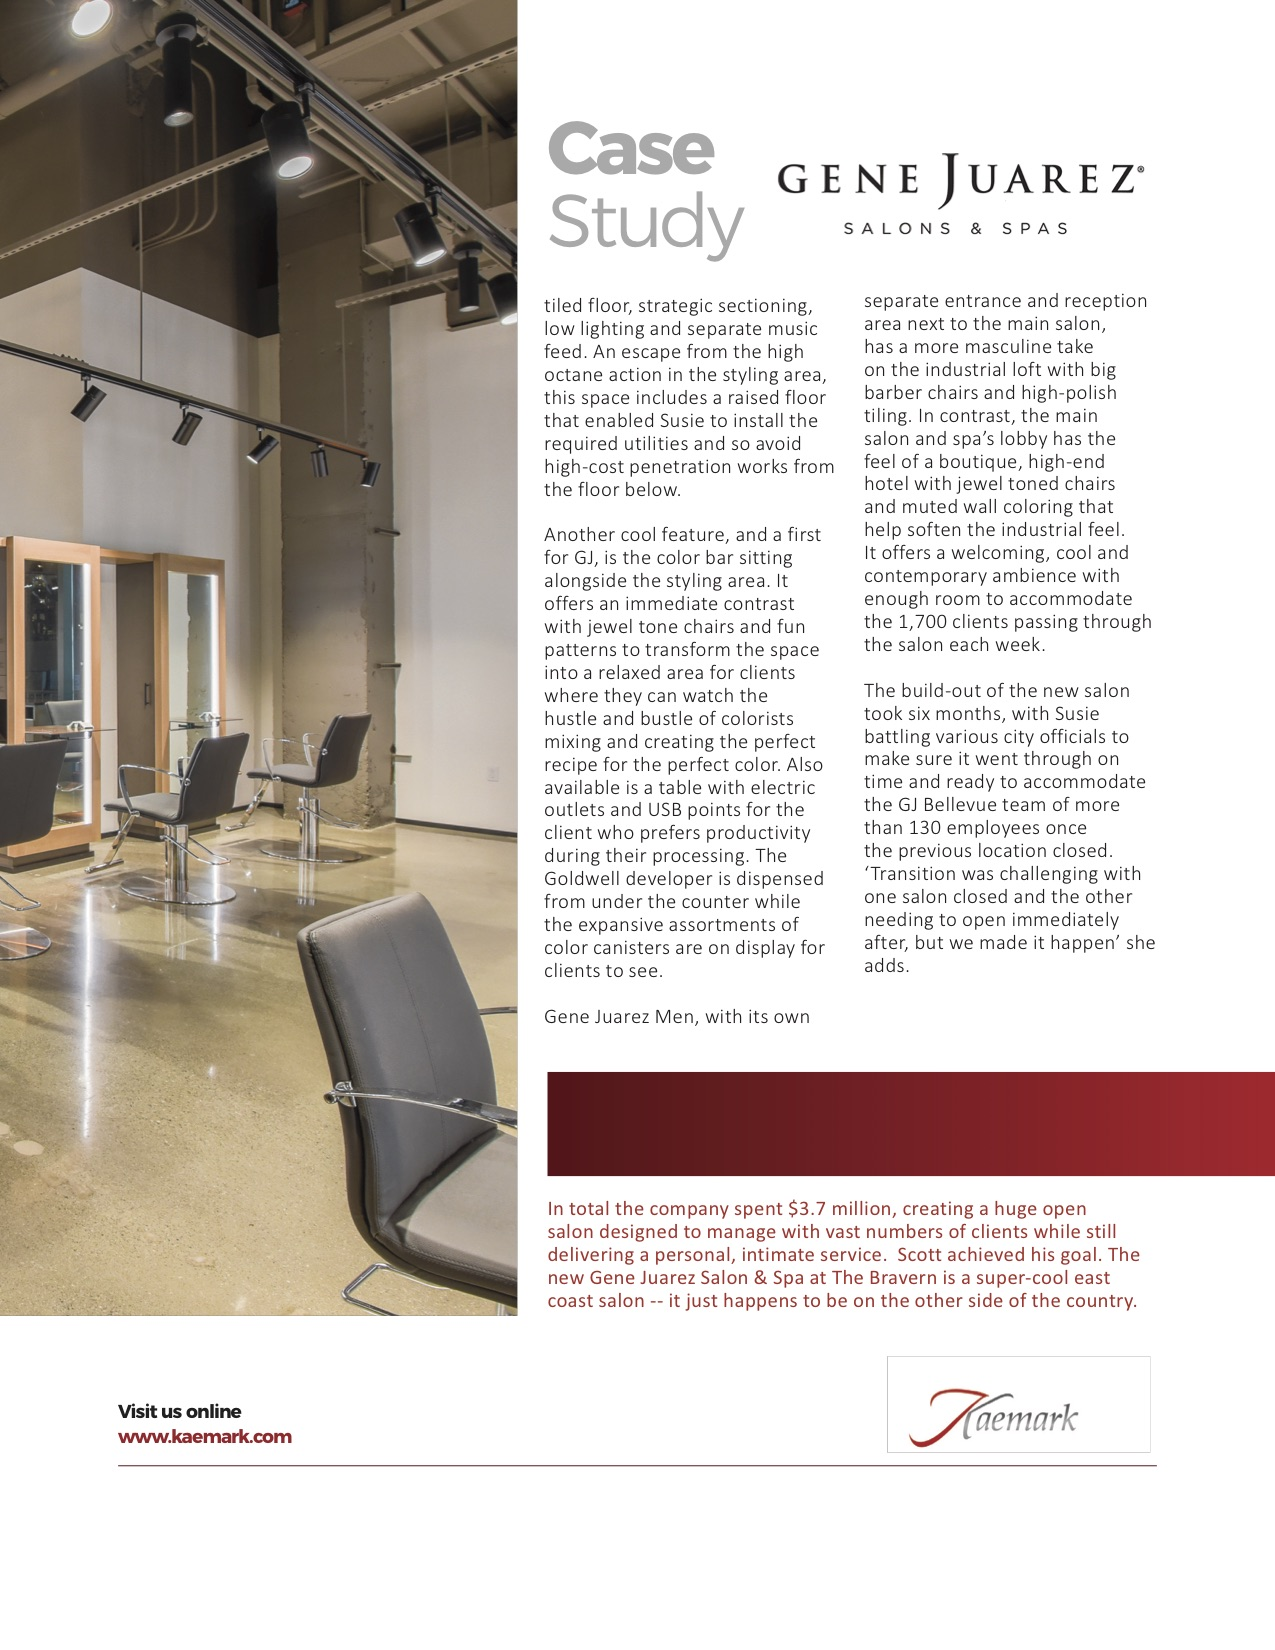 Kaemark Gene Juarez Case Study 70 copy